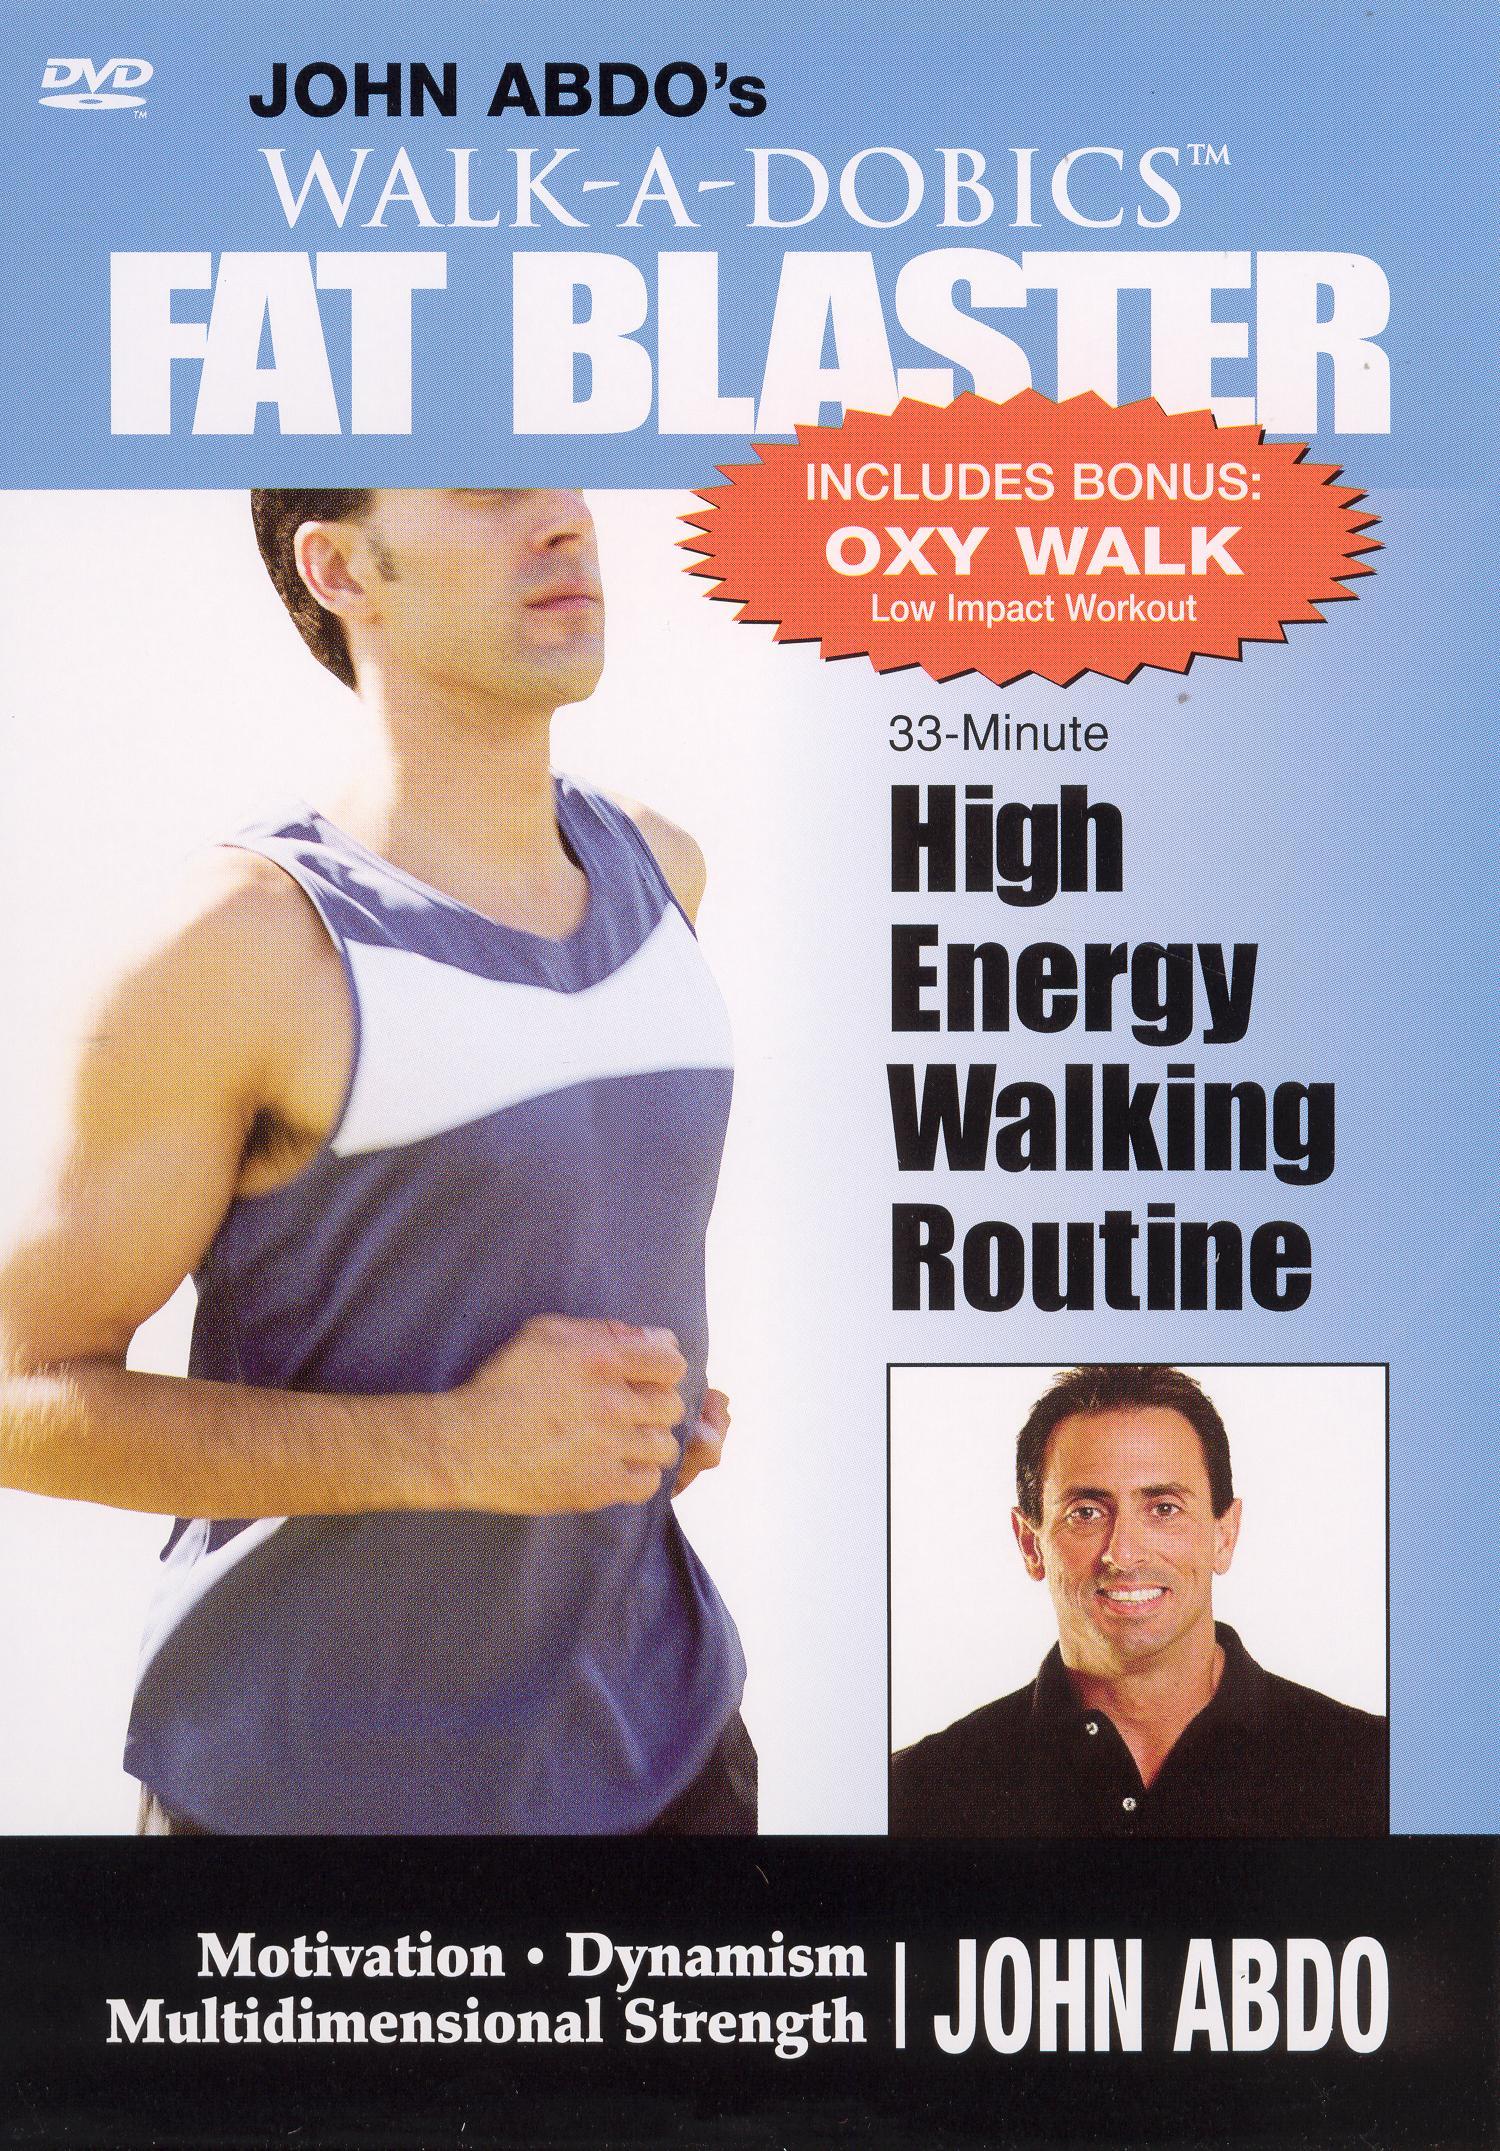 John Abdo's Walk-A-Dobics: Fat Blaster